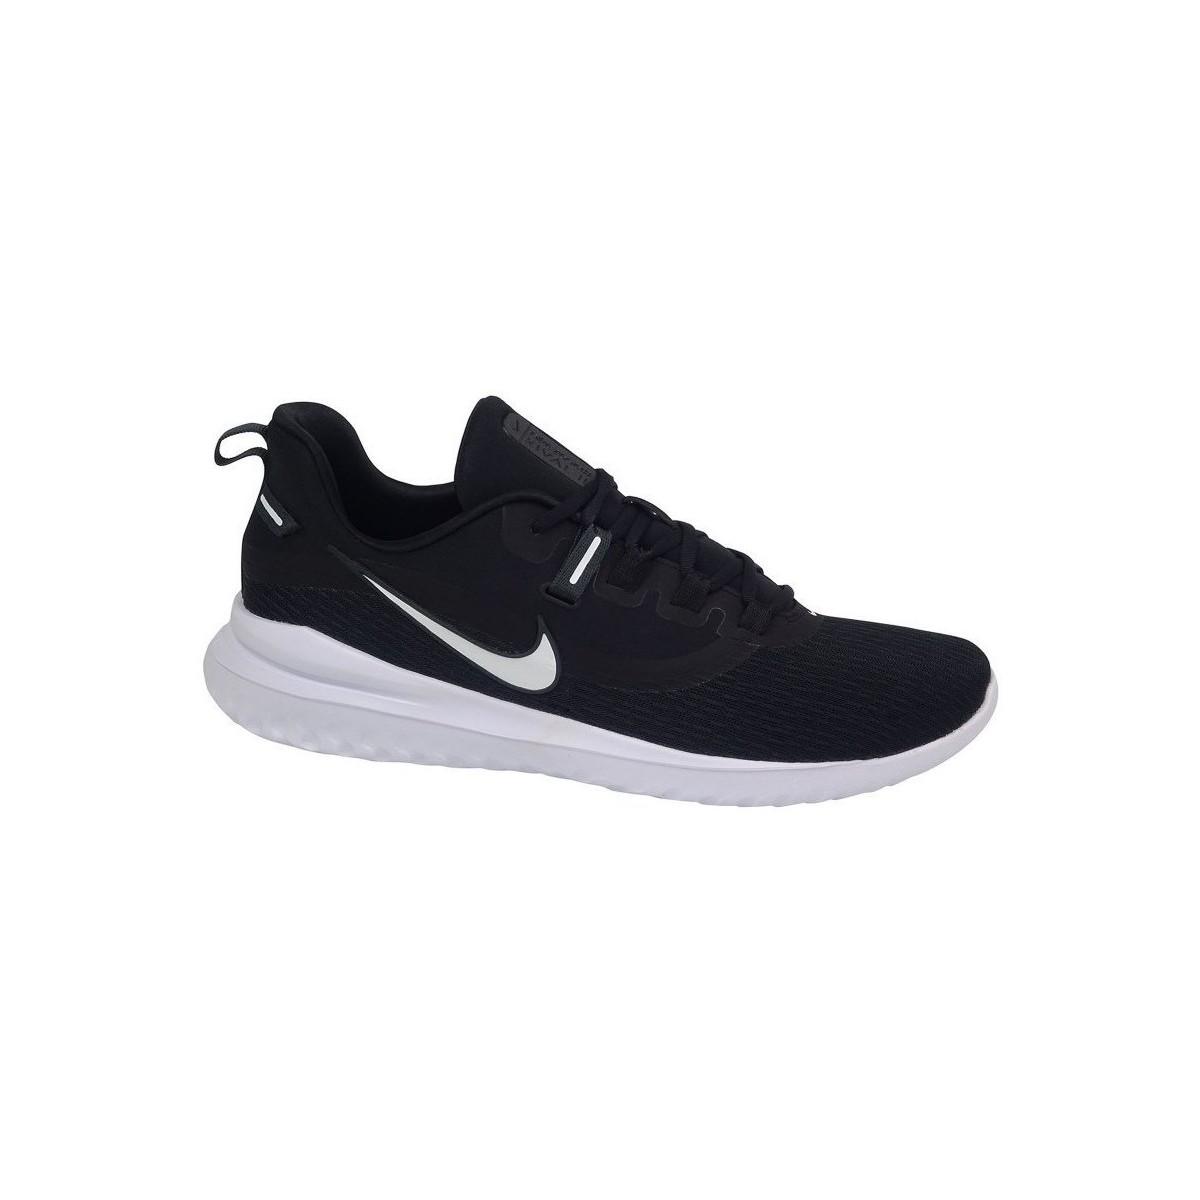 Sneakers Nike  Renew Rival 2